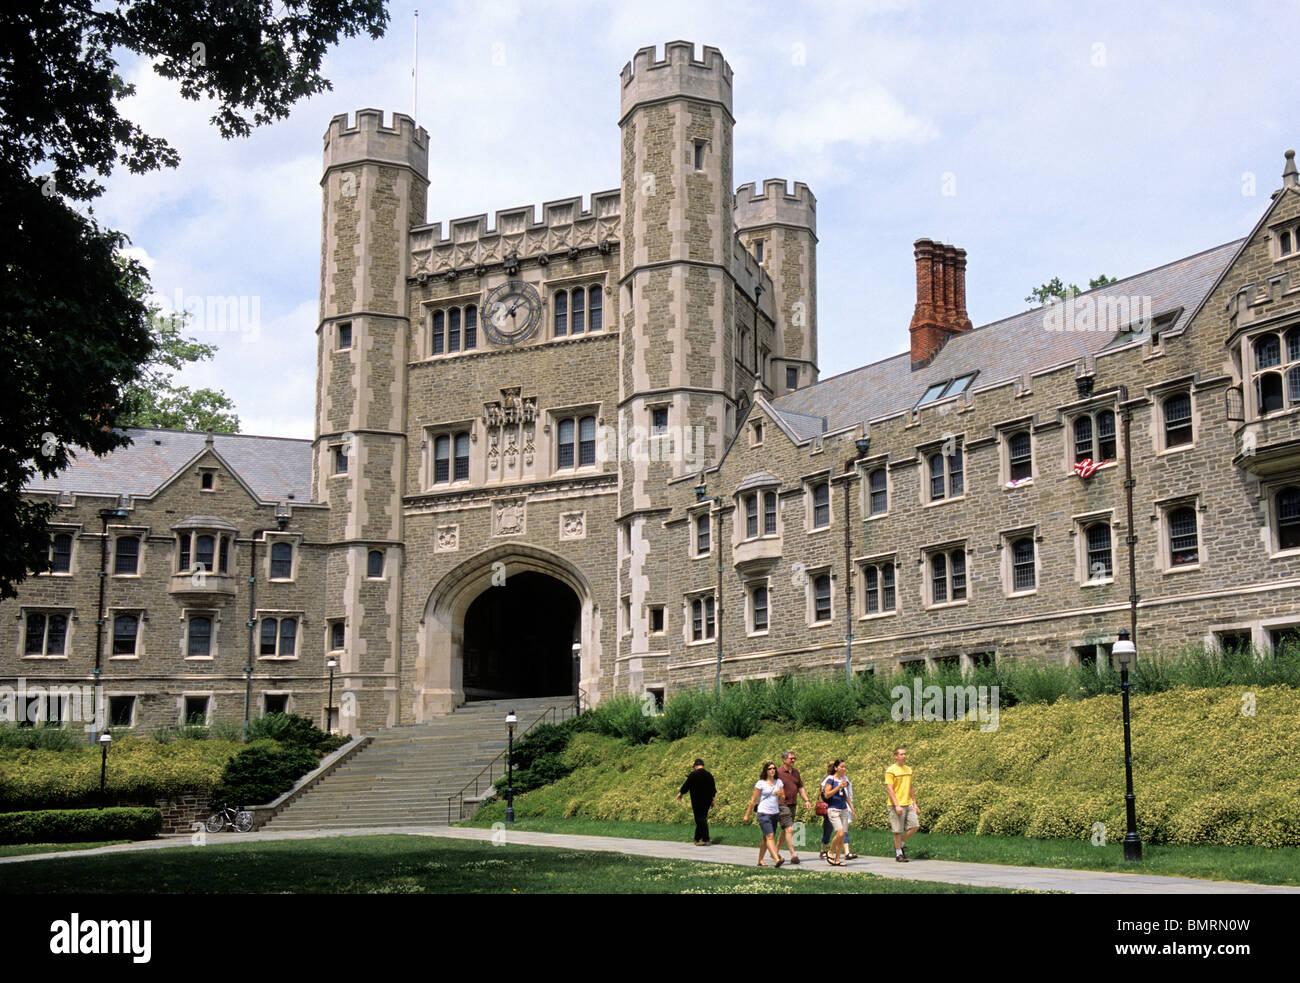 Princeton College Campus Students Stock Photos & Princeton College ...